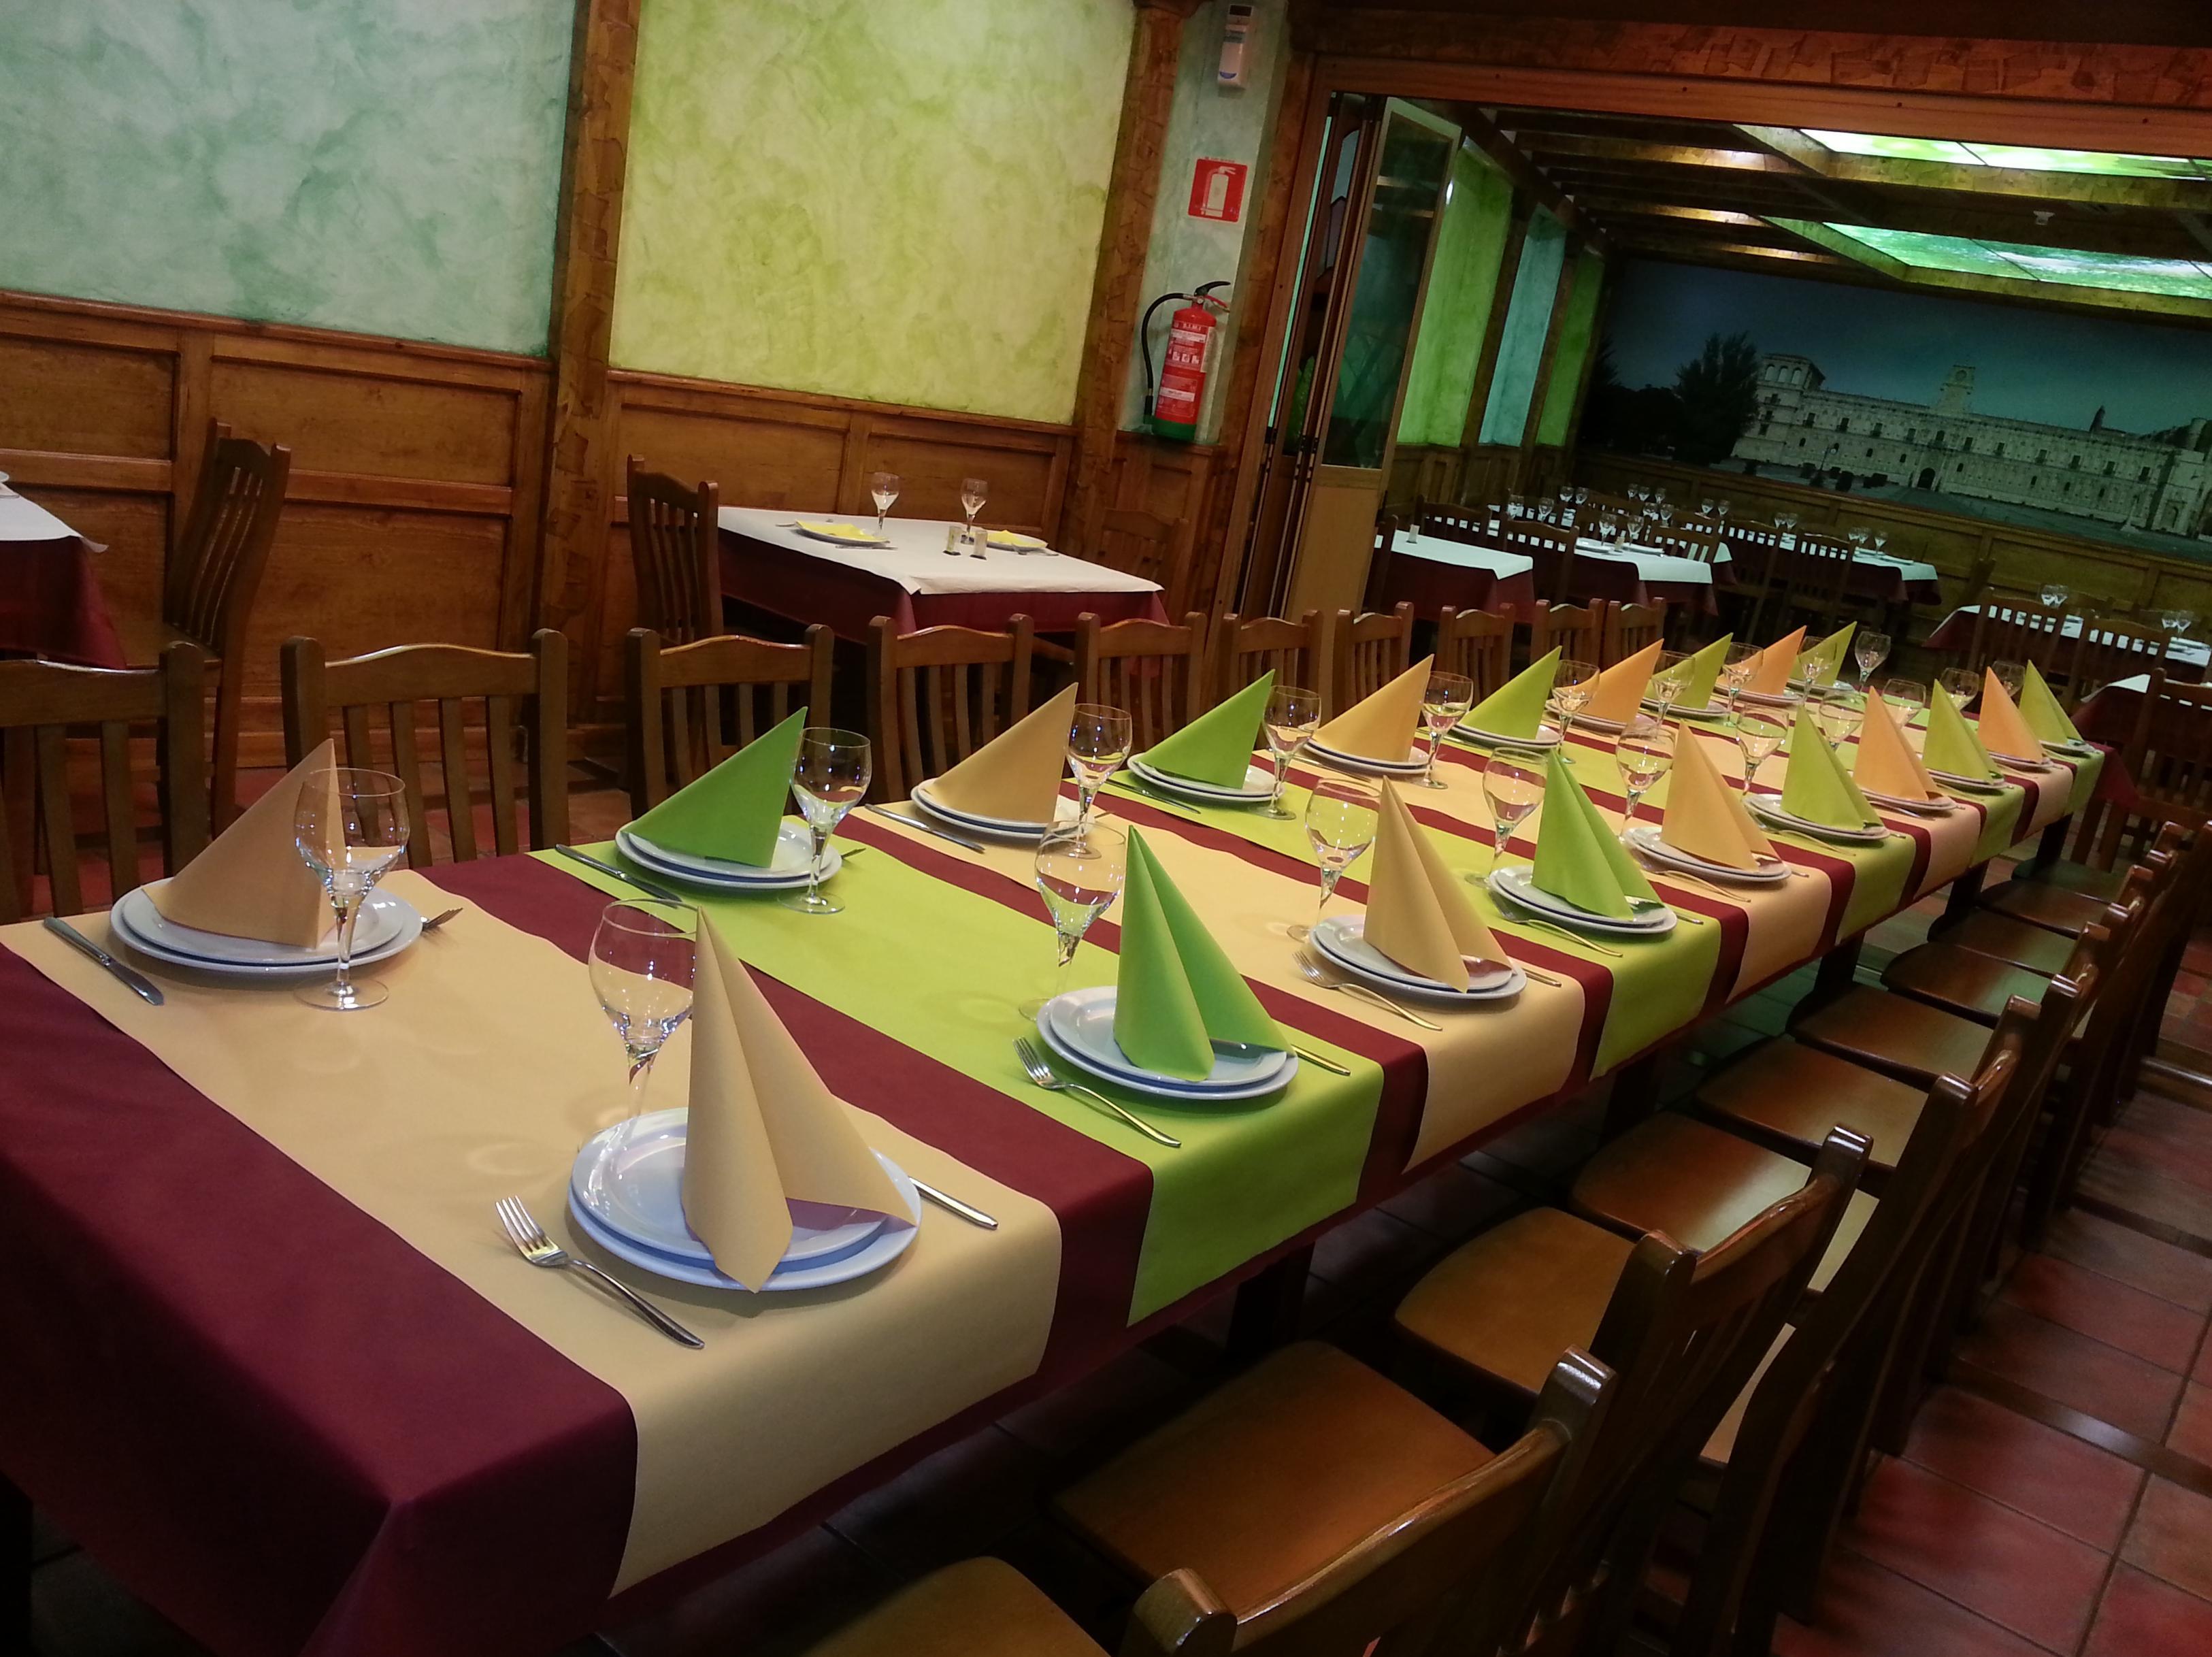 Foto 3 de Cocina tradicional en Valencia de Don Juan | Mesón Restaurante El Pesebre